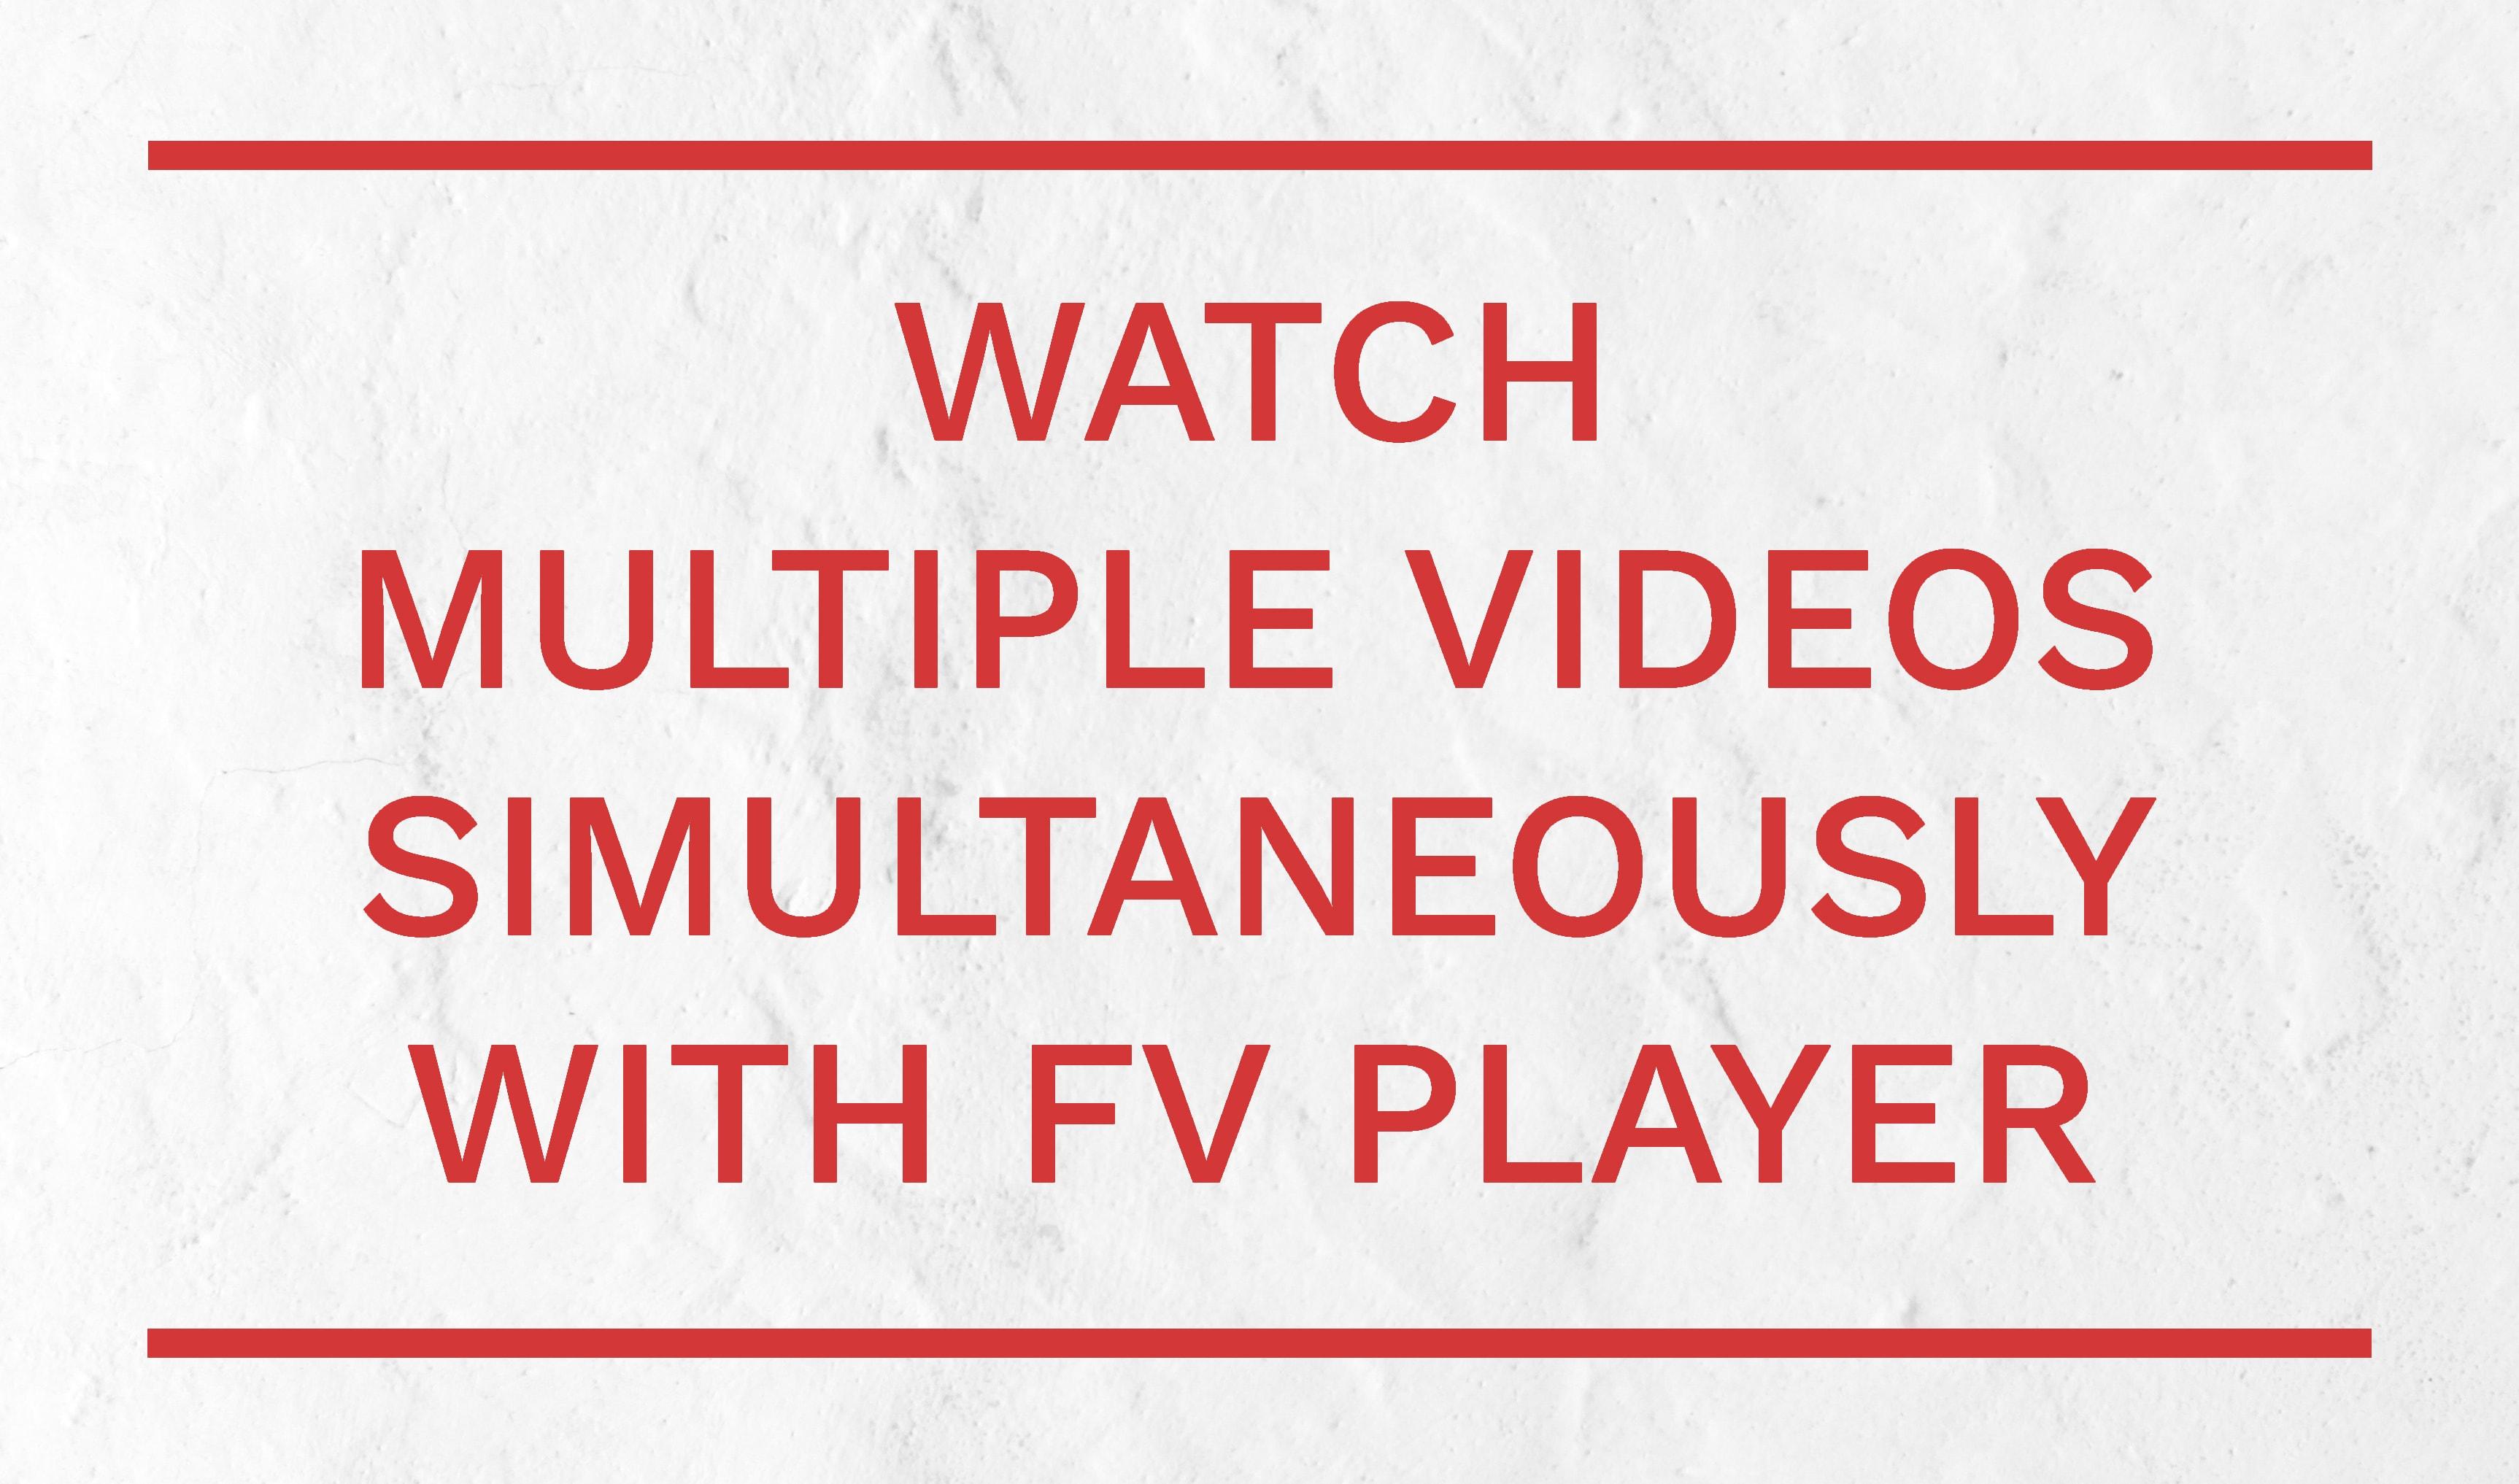 Multiple videos playback